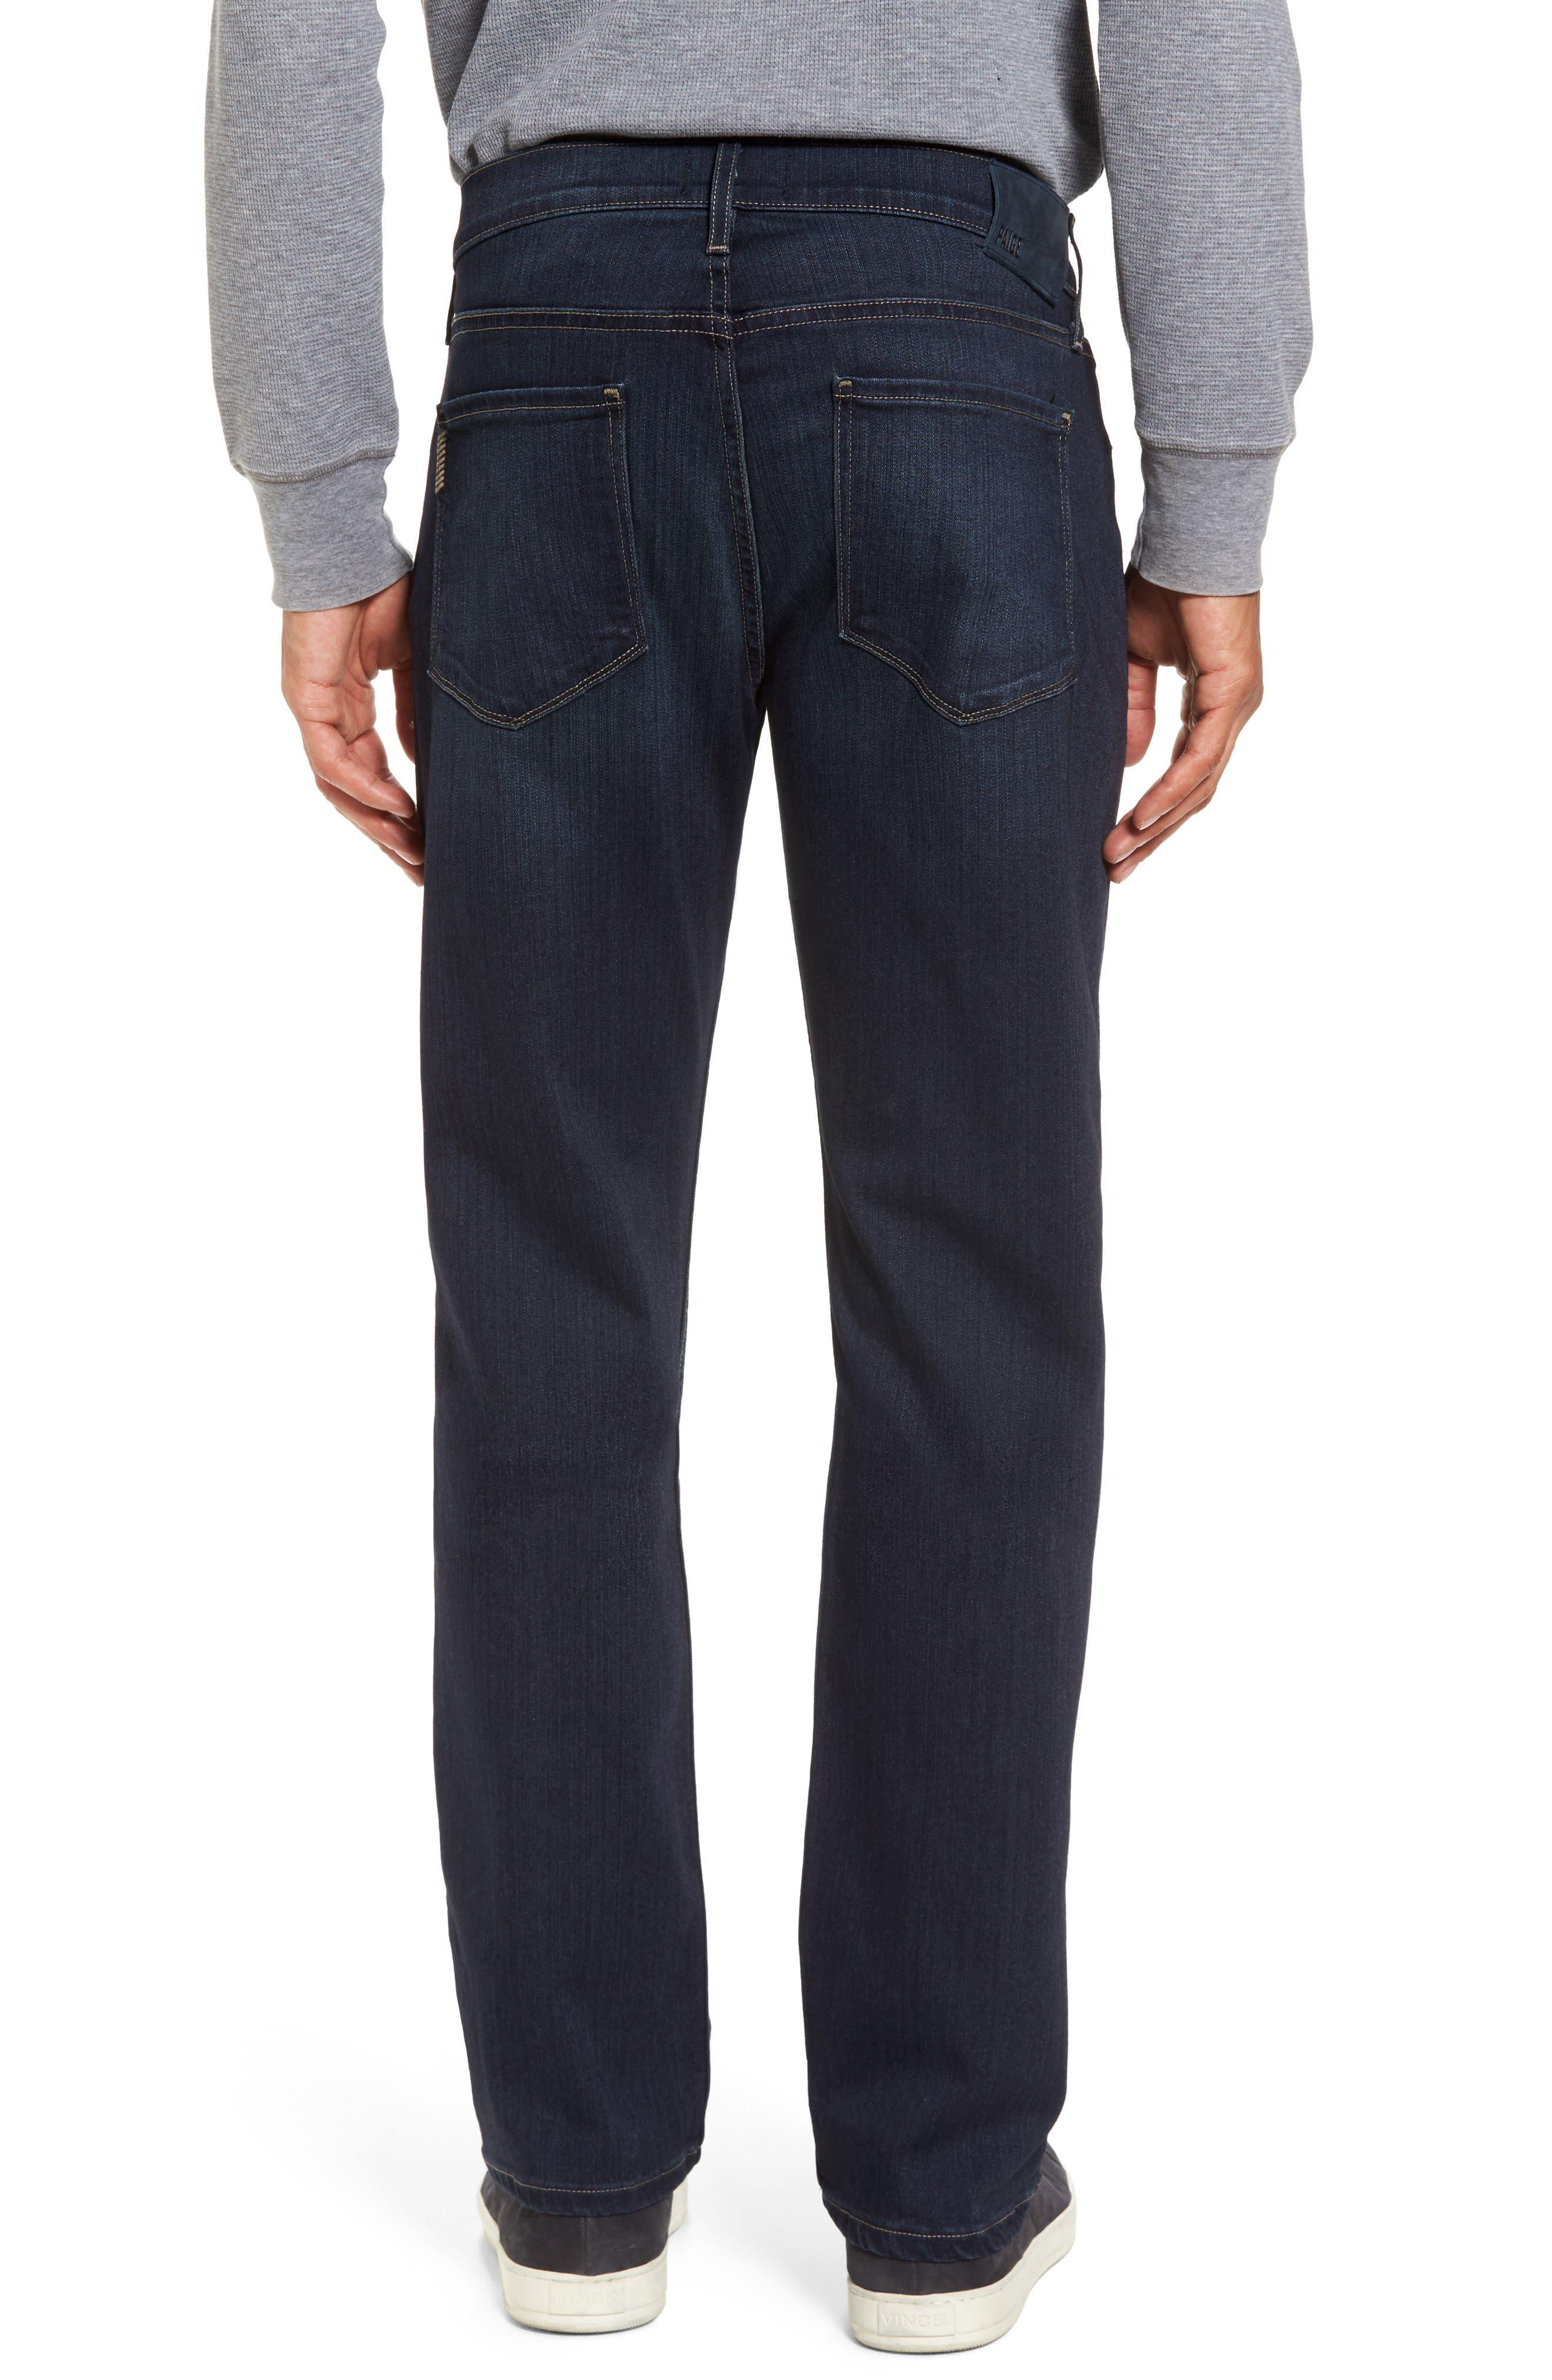 Transcend - Normandie Straight Fit Jeans,                             Alternate thumbnail 2, color,                             400